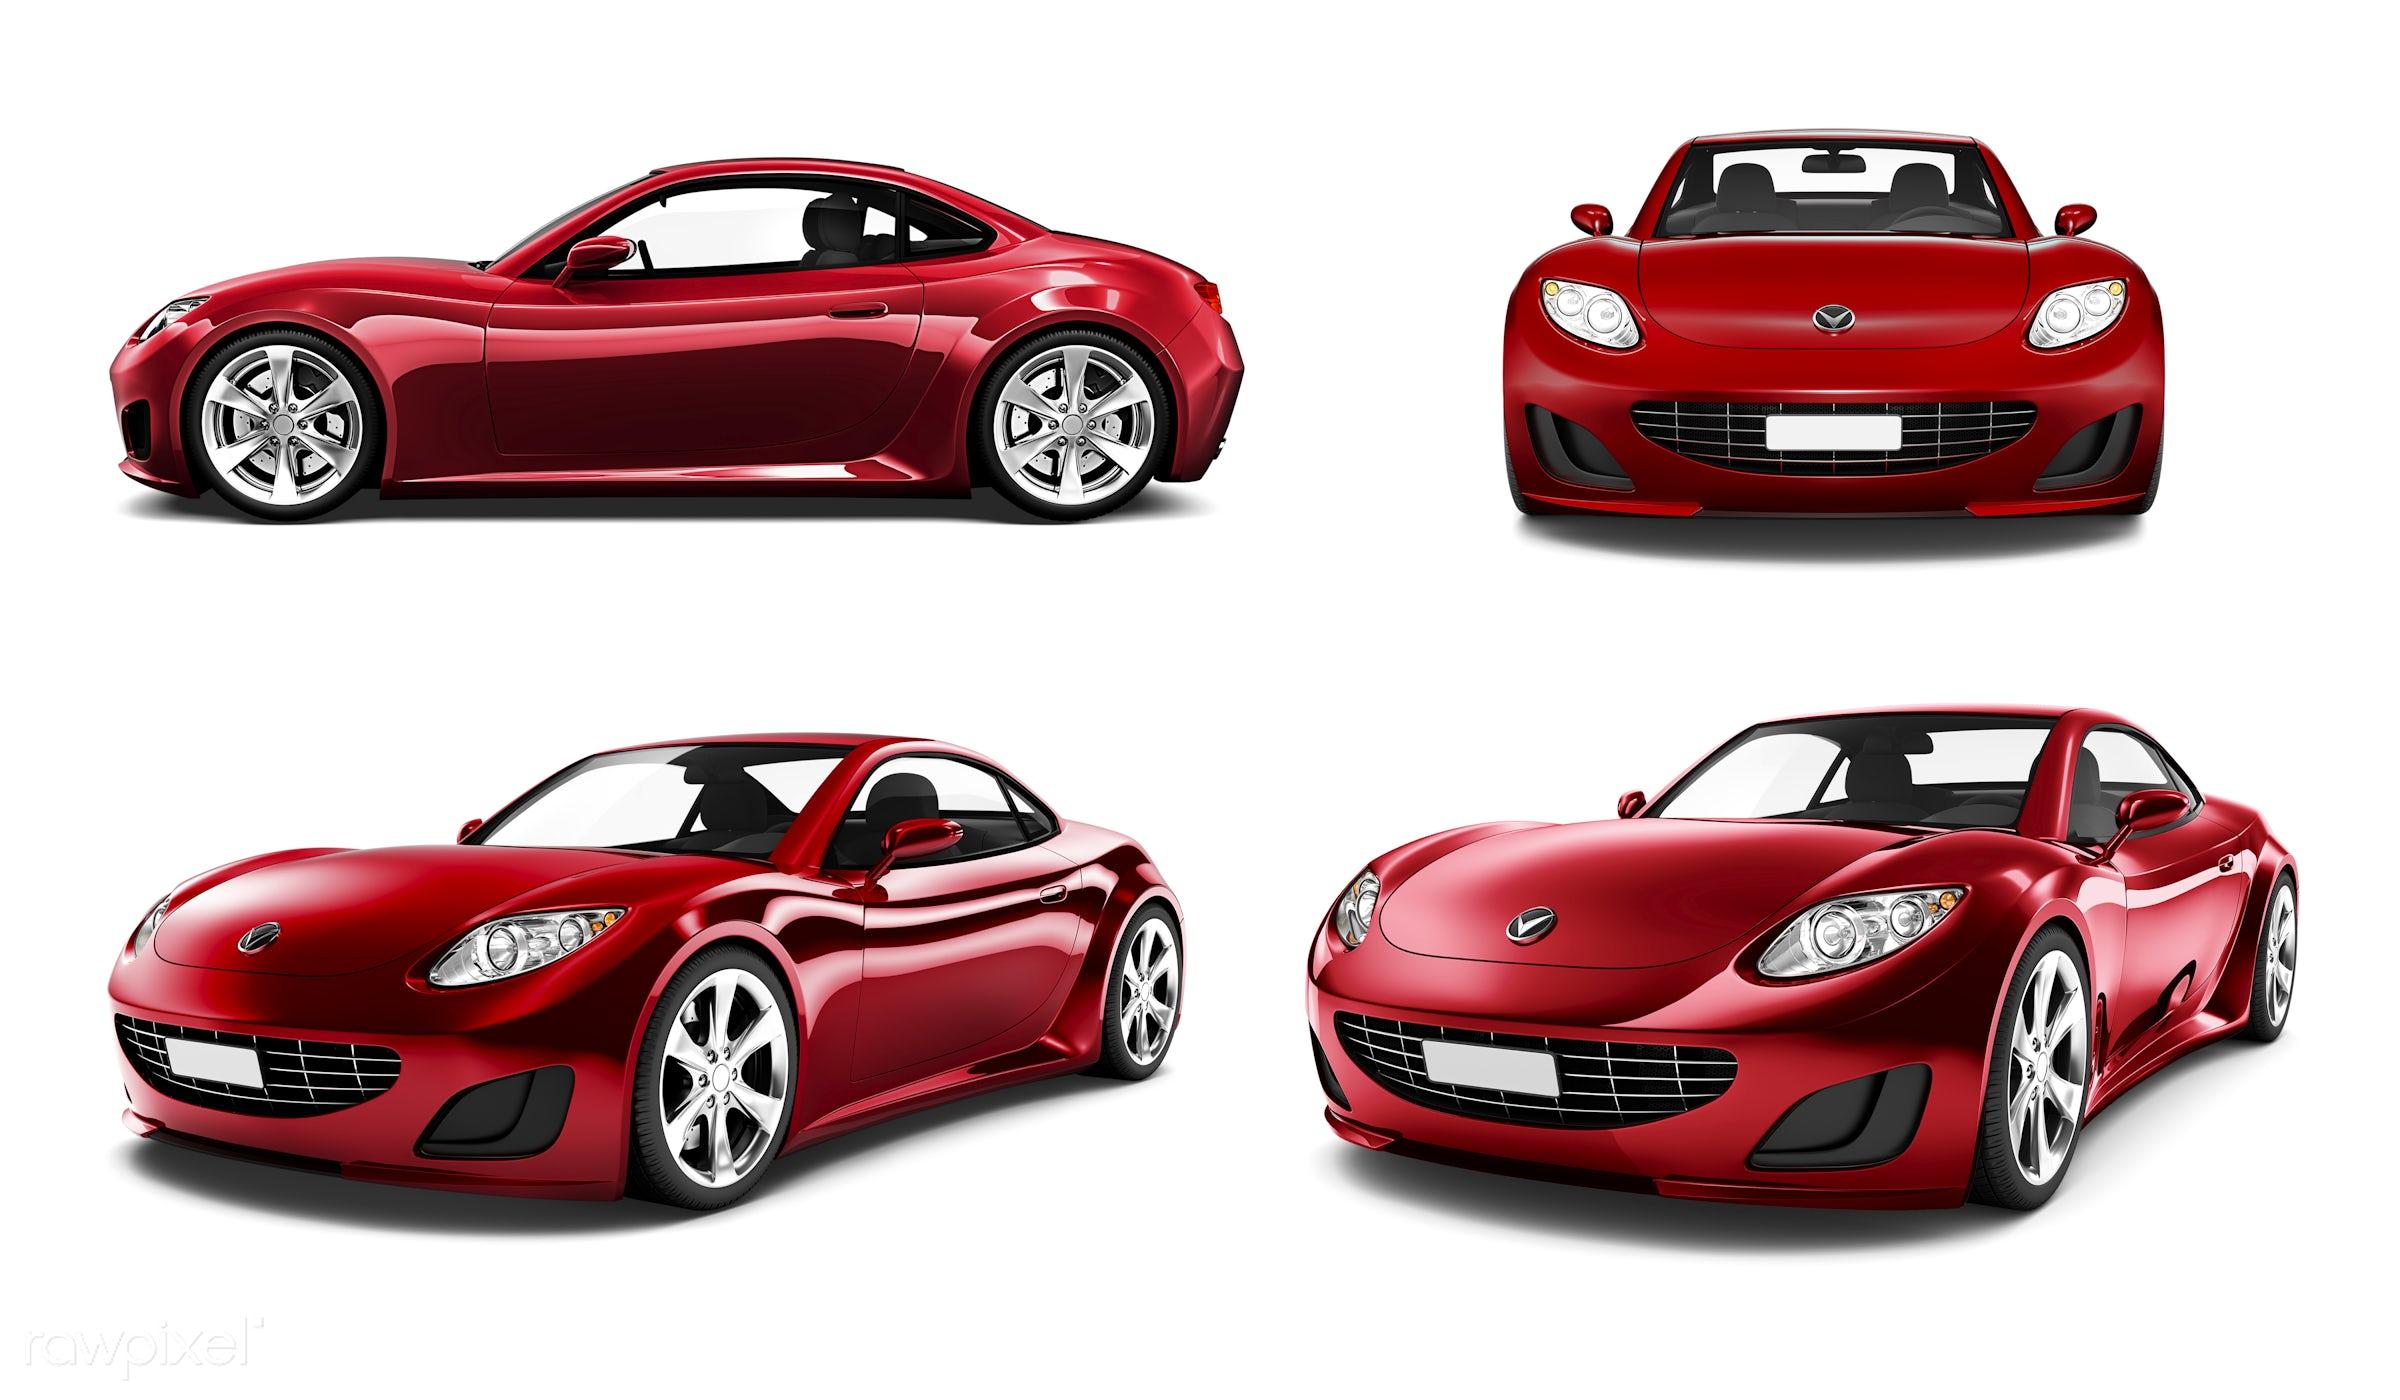 Three dimensional image of car - car, 3d, automobile, automotive, brandless, collection, concept car, elegant, graphic,...